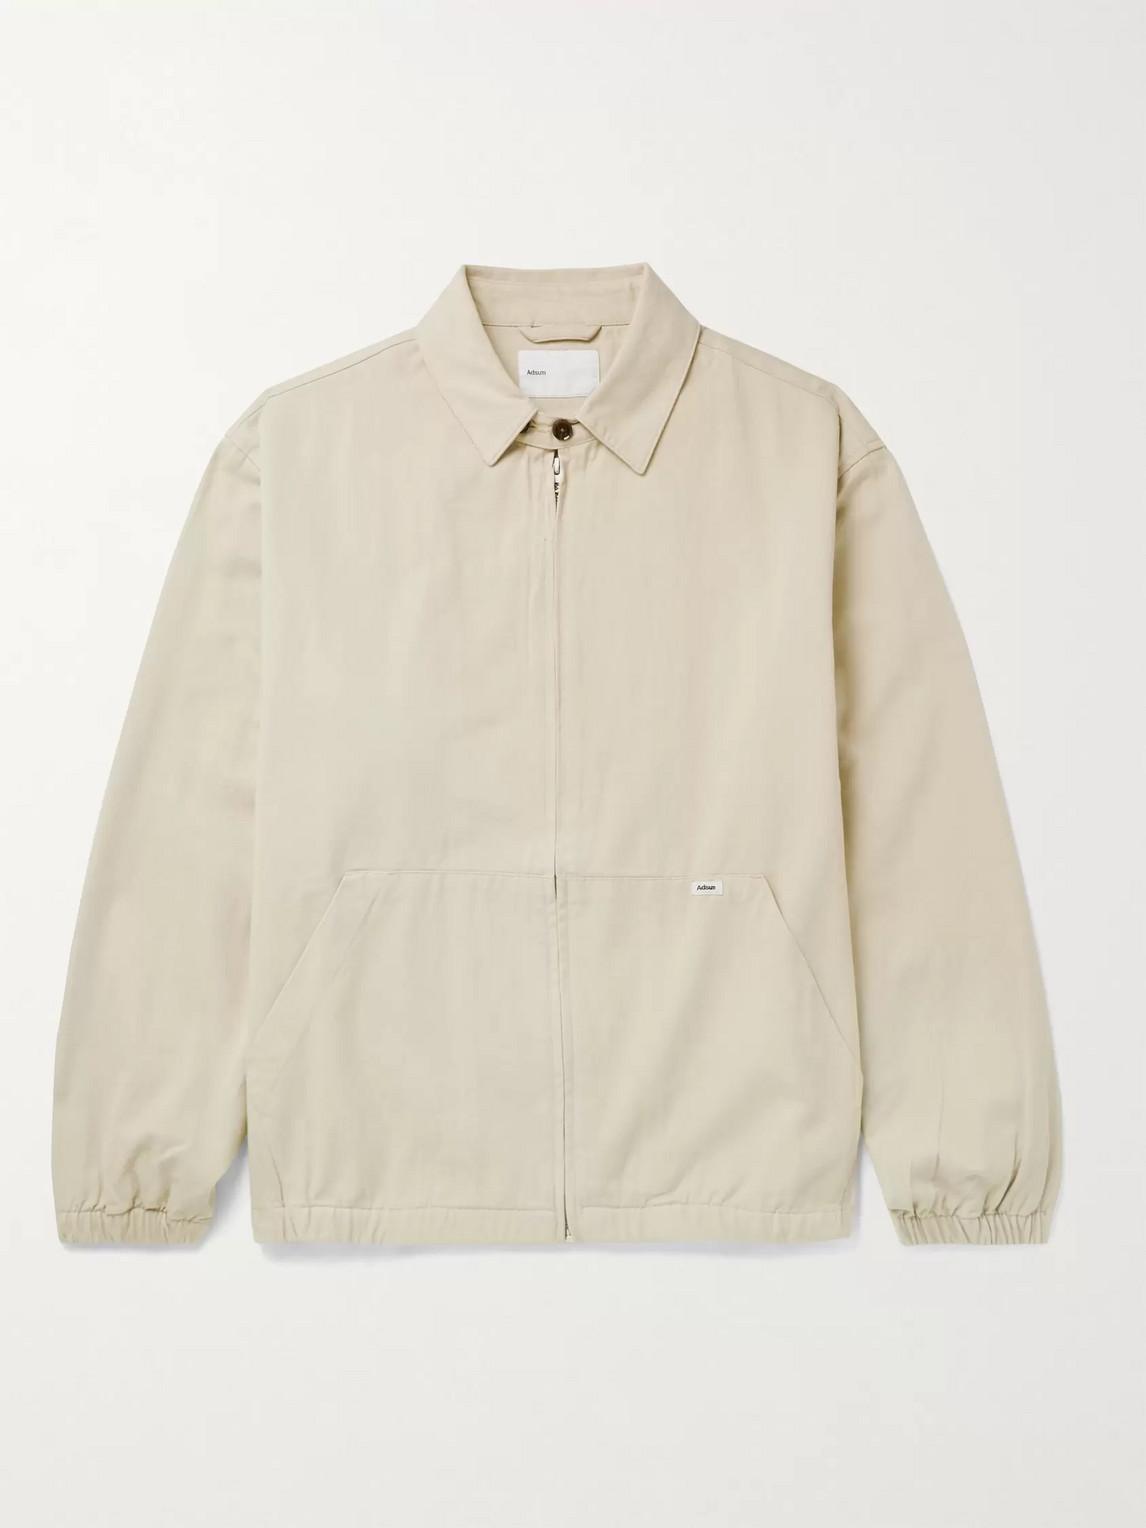 Adsum Crew Cotton-twill Harrington Jacket In Neutrals